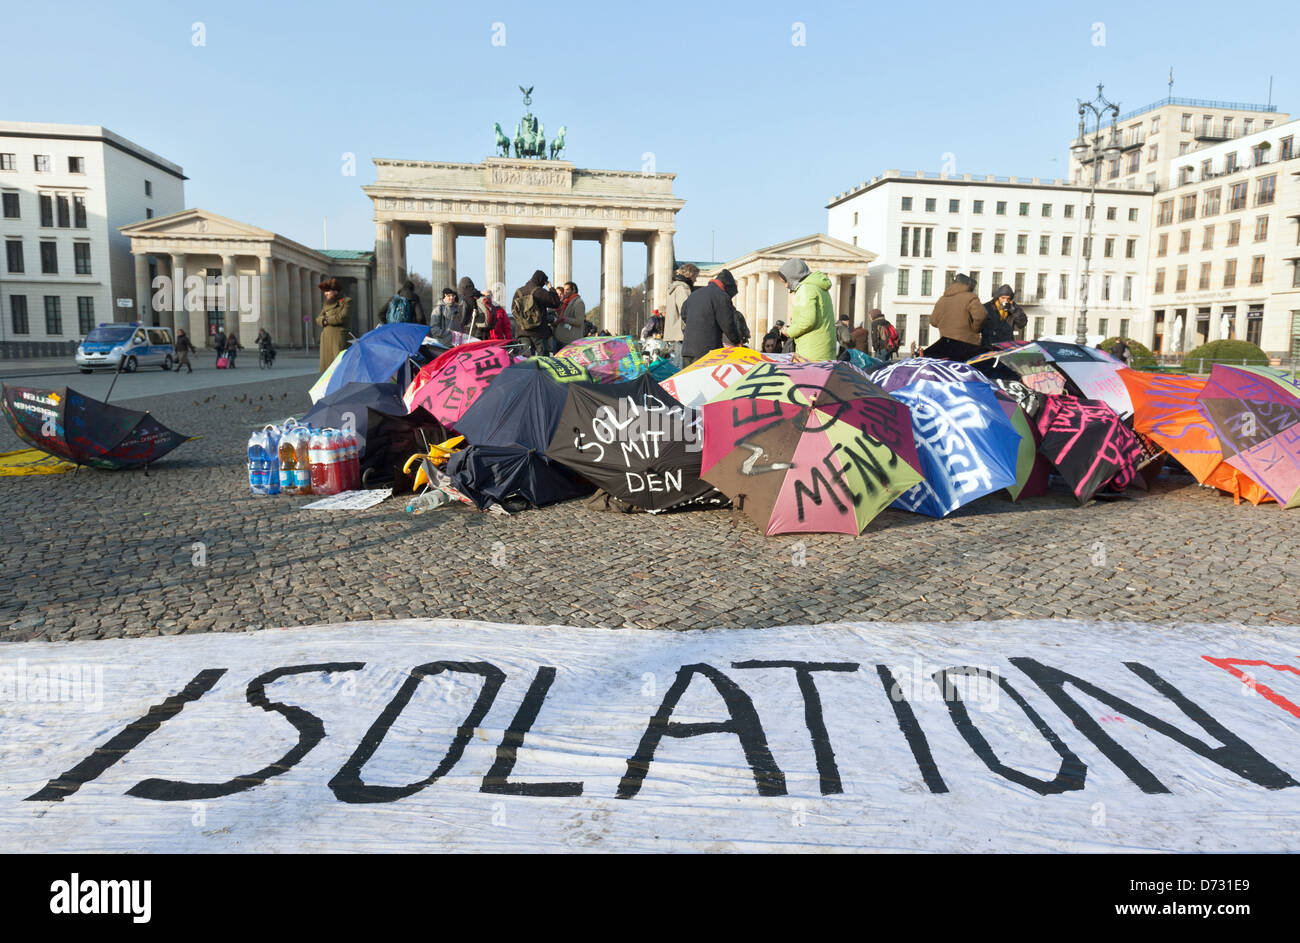 Berlin, Germany, the Refugee hunger strike in front of the Brandenburg Gate - Stock Image